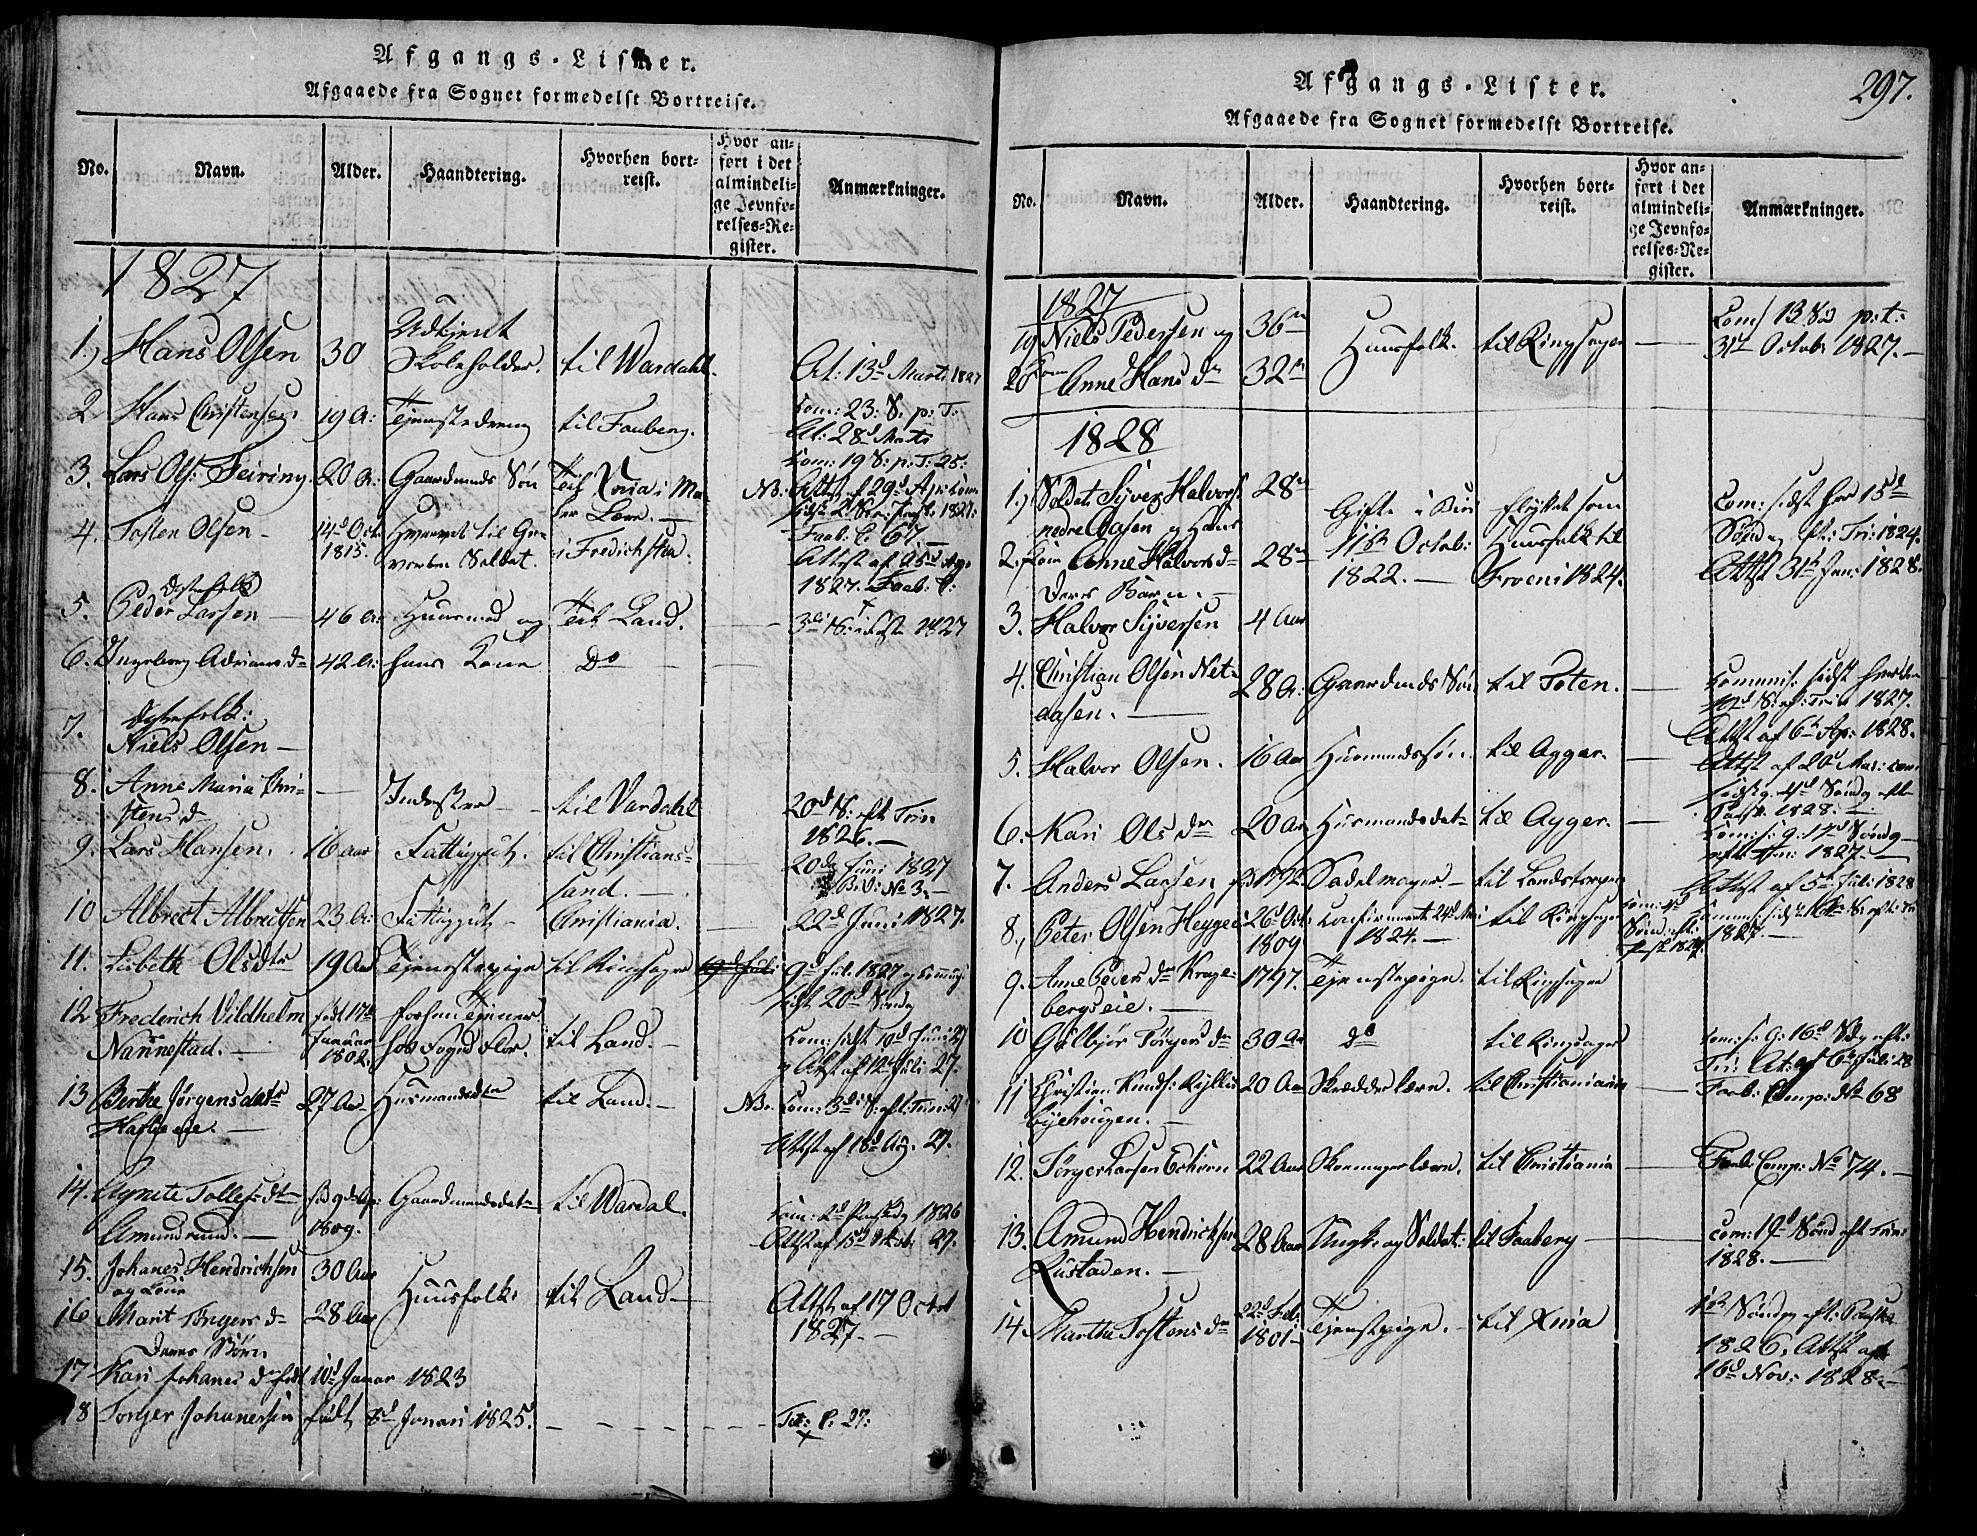 SAH, Biri prestekontor, Klokkerbok nr. 1, 1814-1828, s. 297